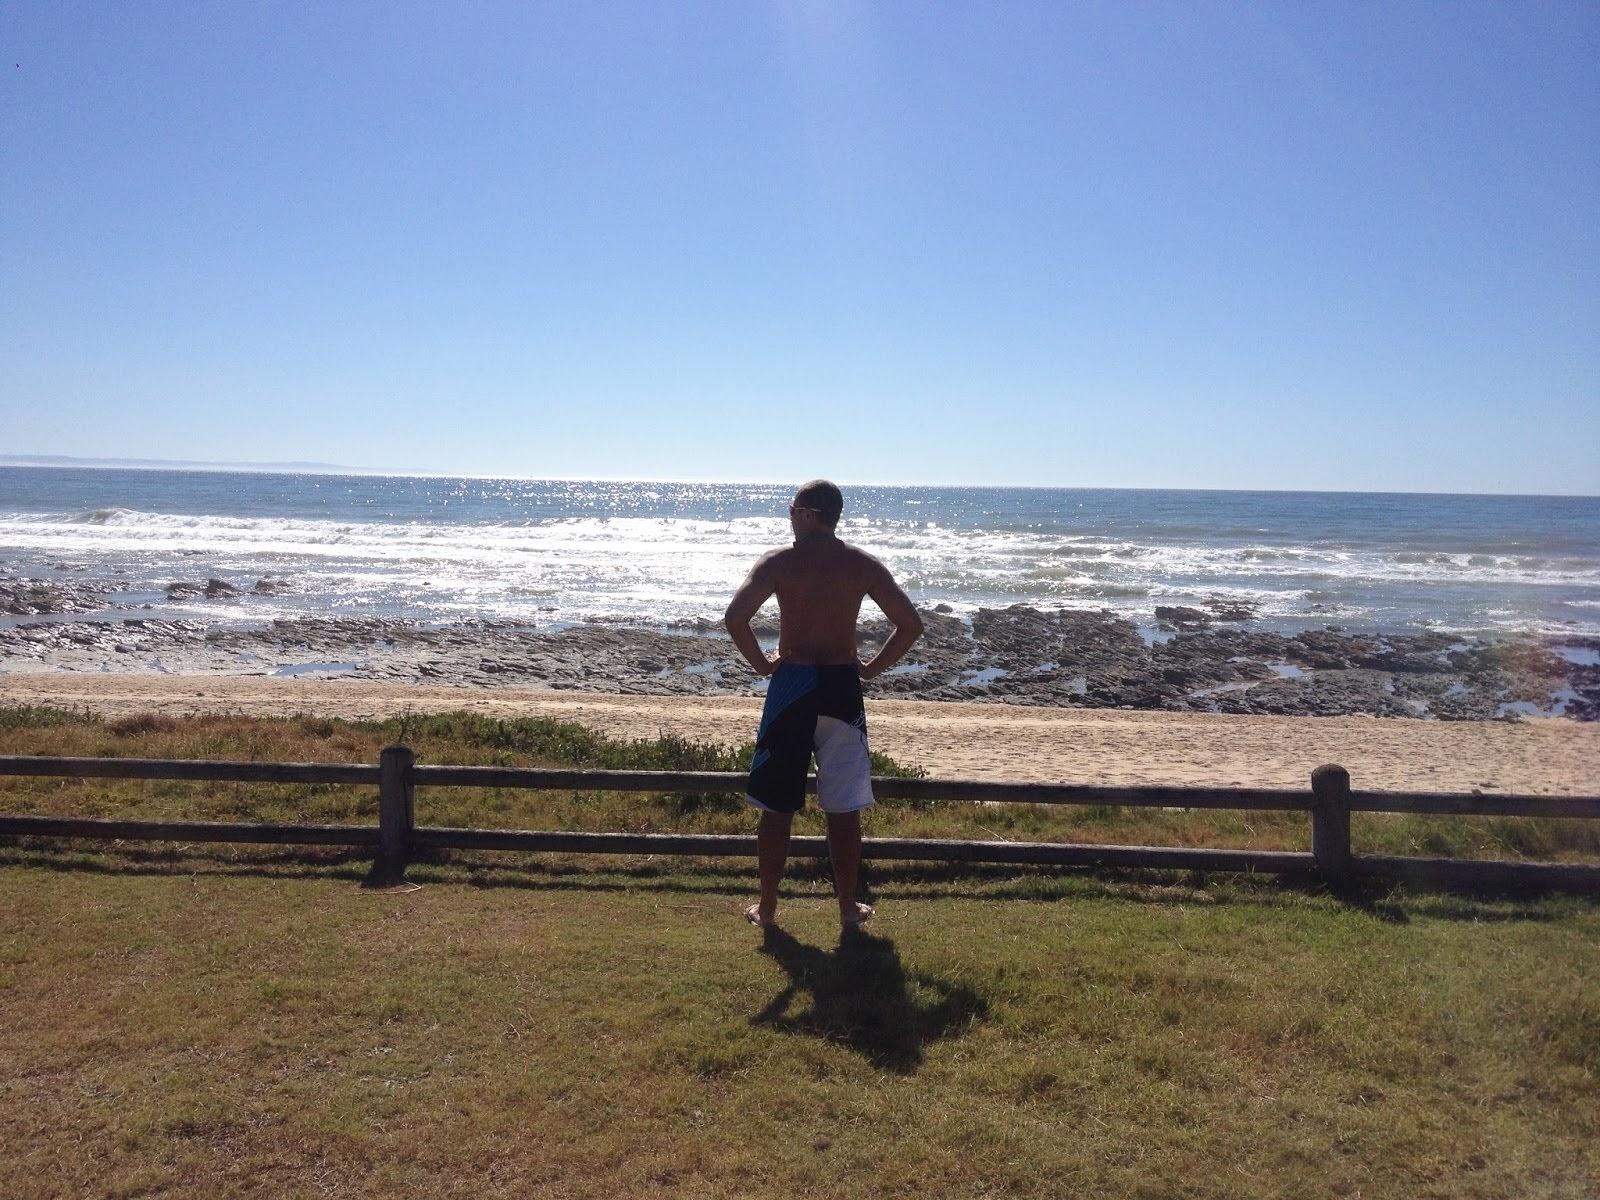 Jeffrey's Bay